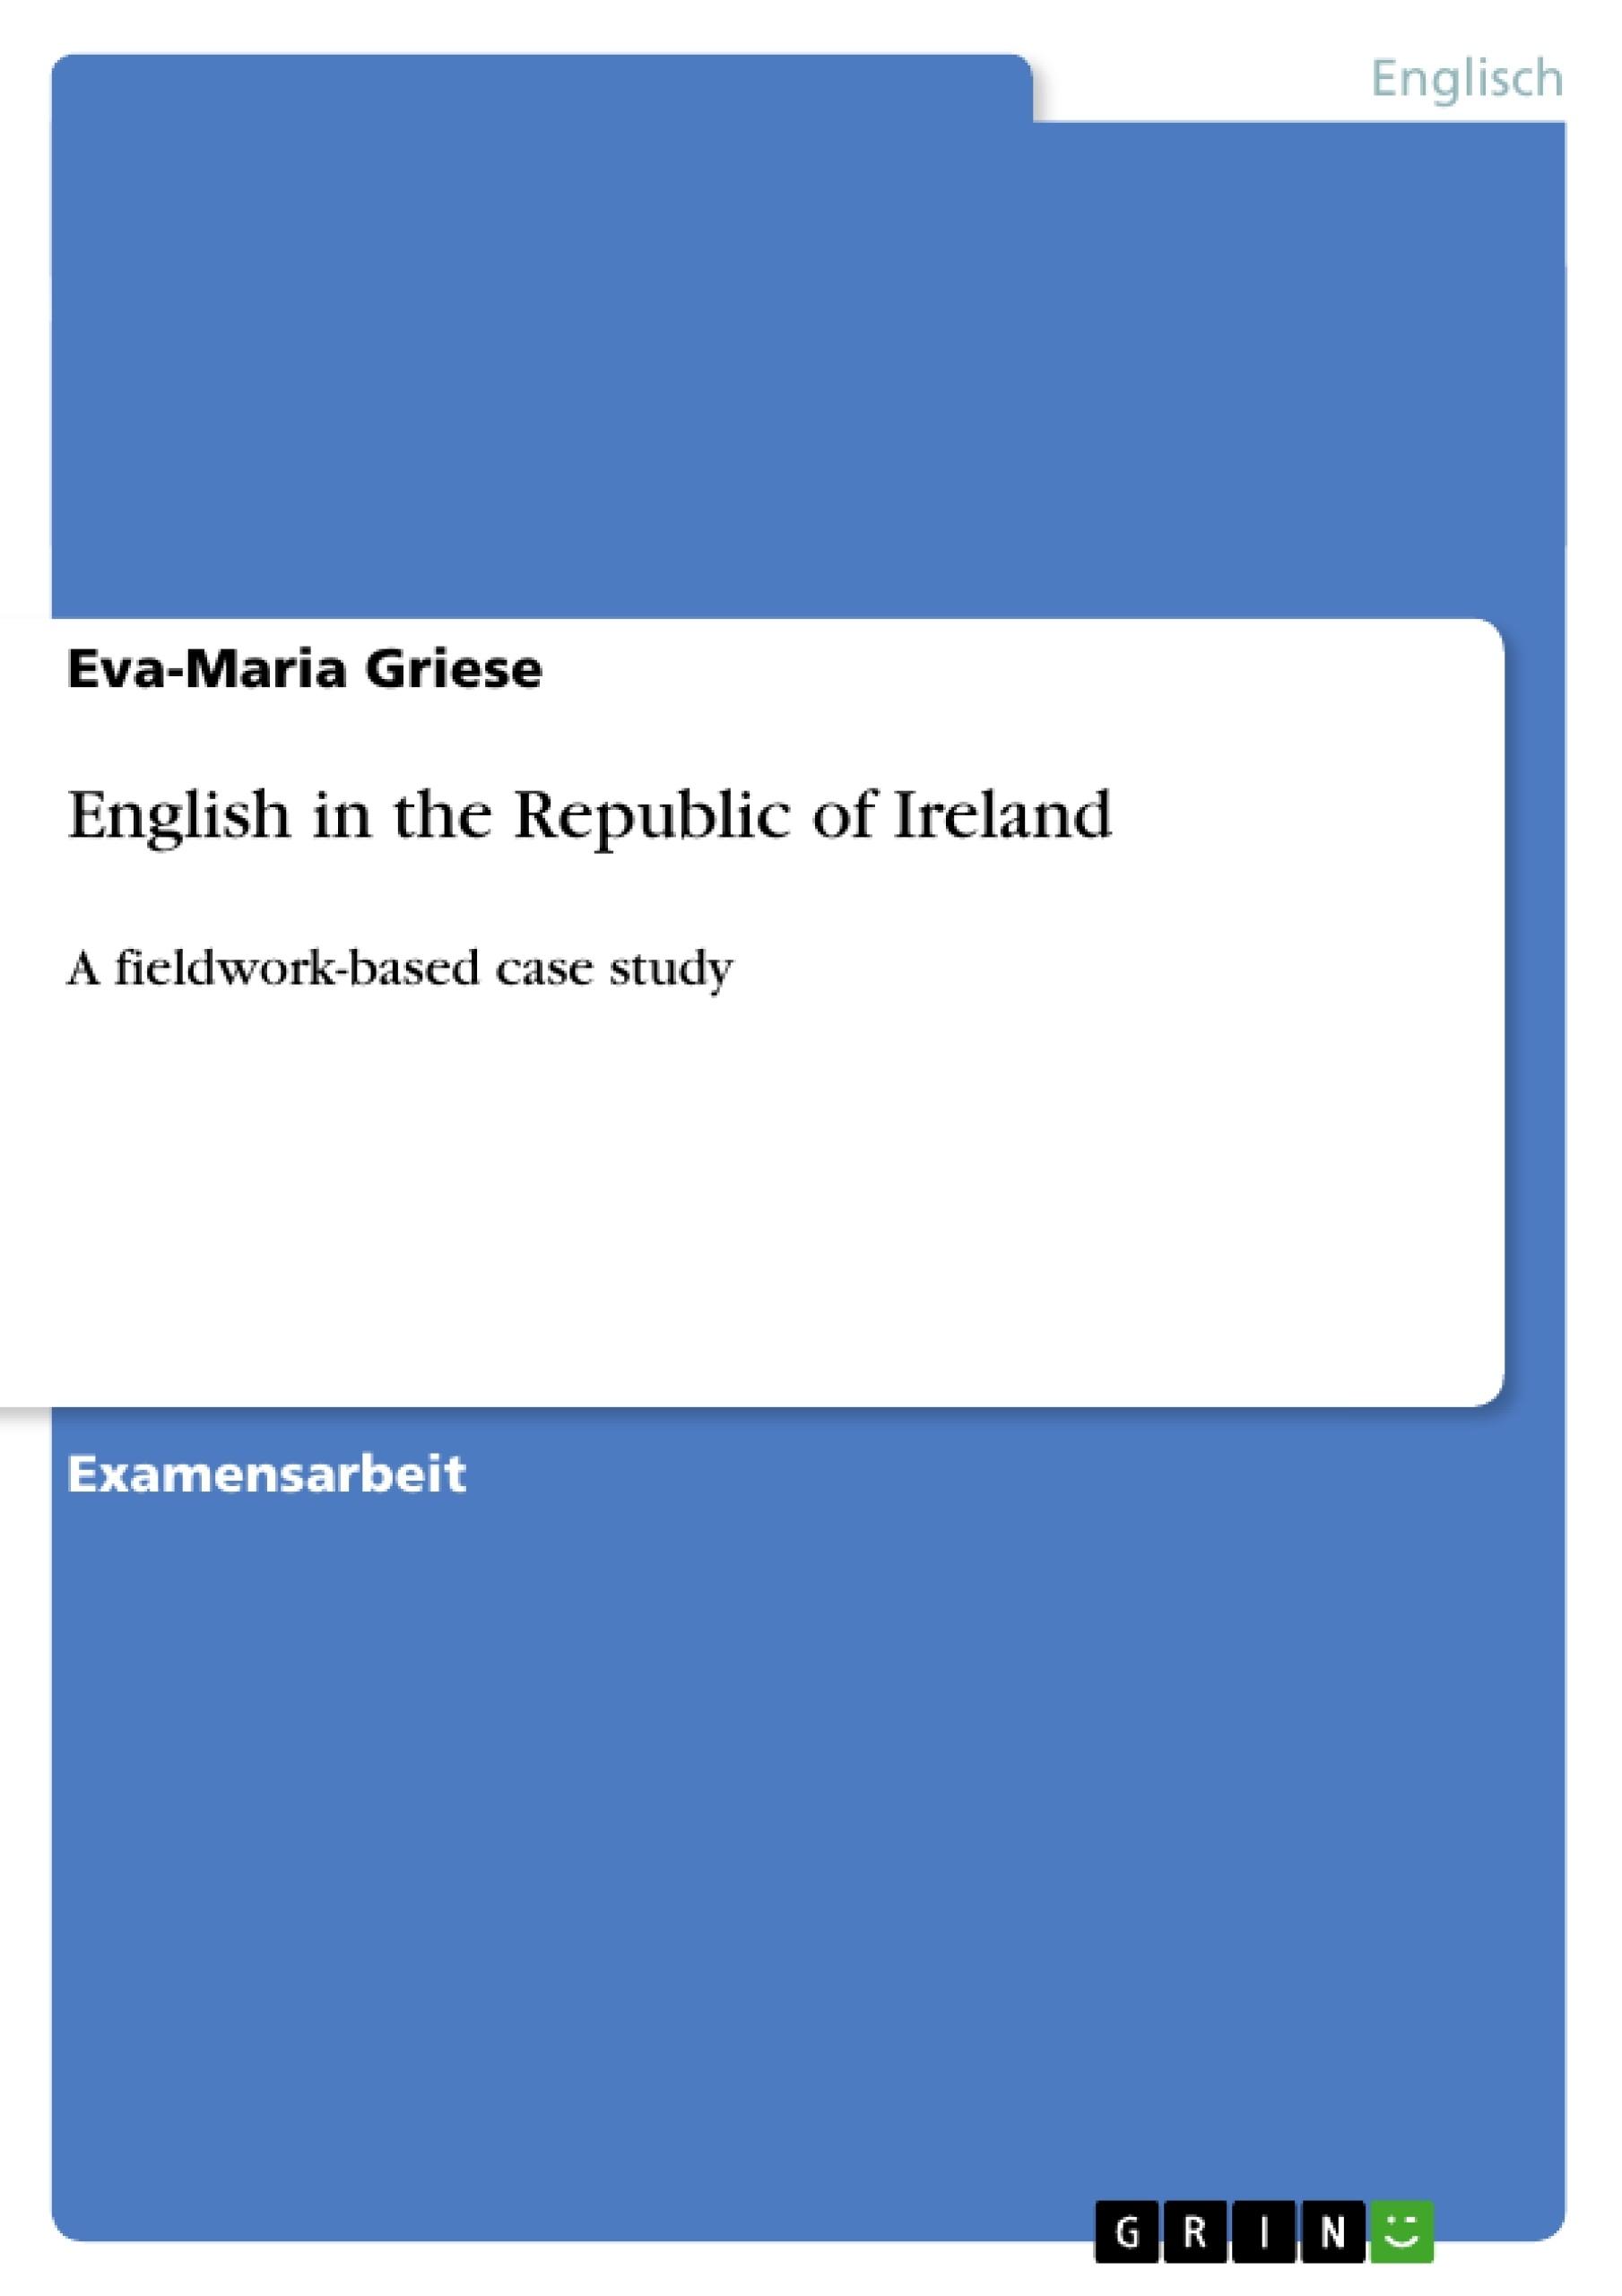 Titel: English in the Republic of Ireland